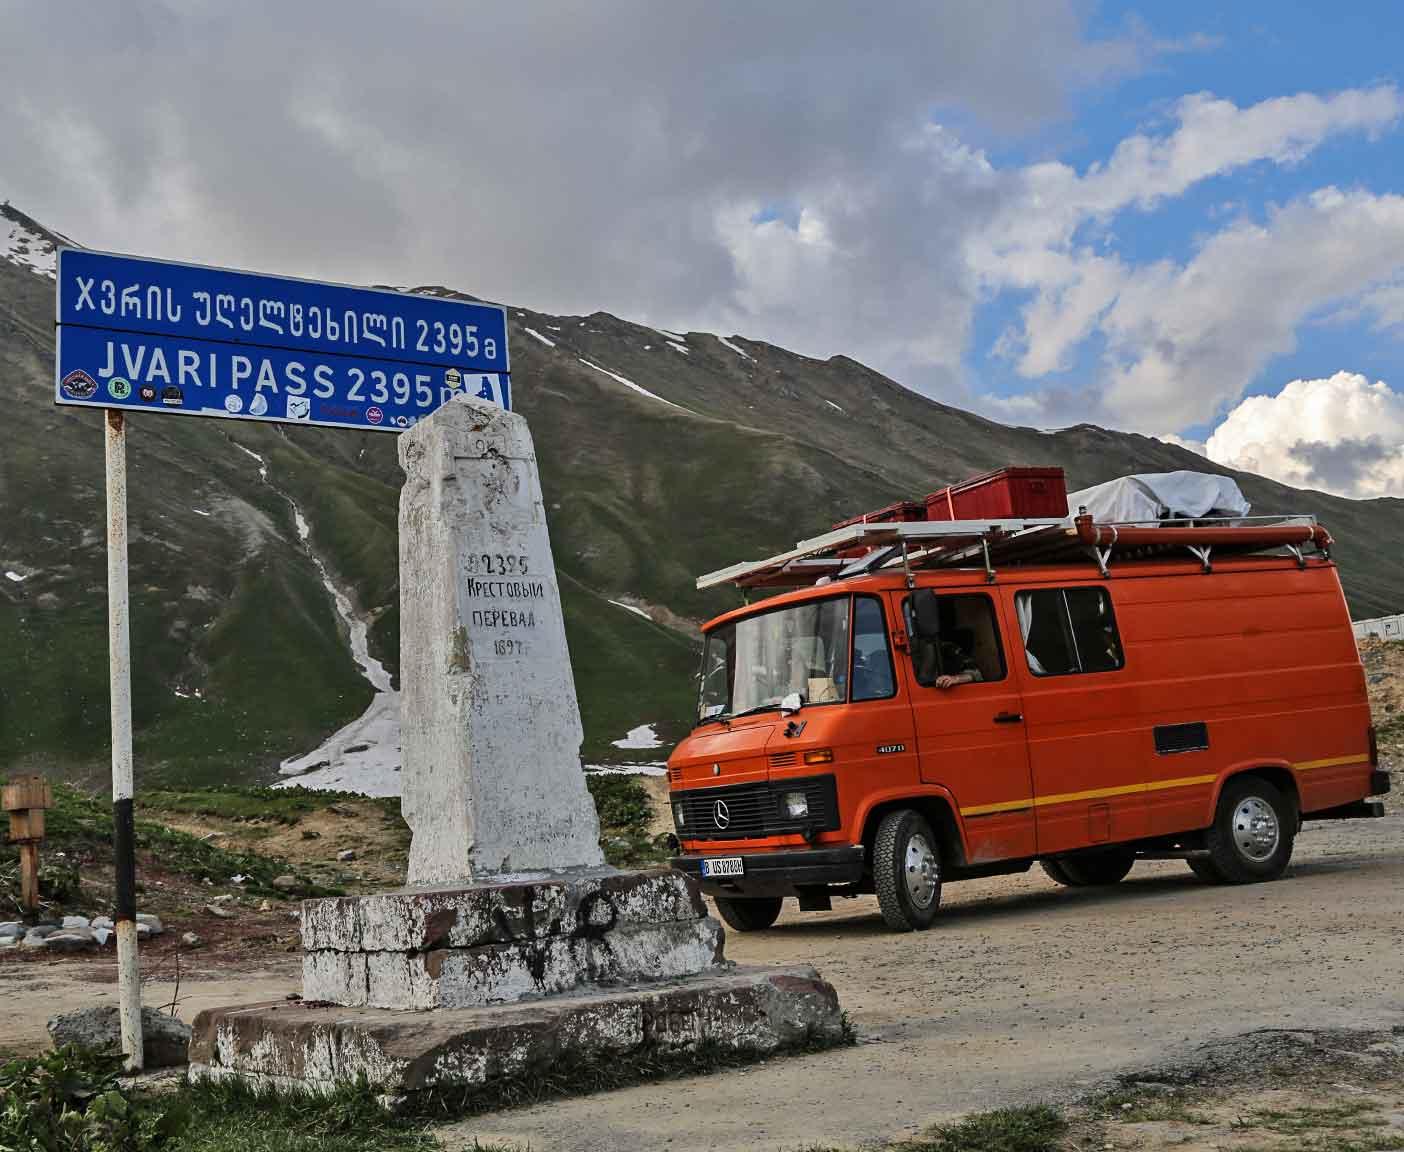 georgien-wohnmobil-erfahrungsbericht-camping-urlaub-preisniveau-tiflis-jvari-pass